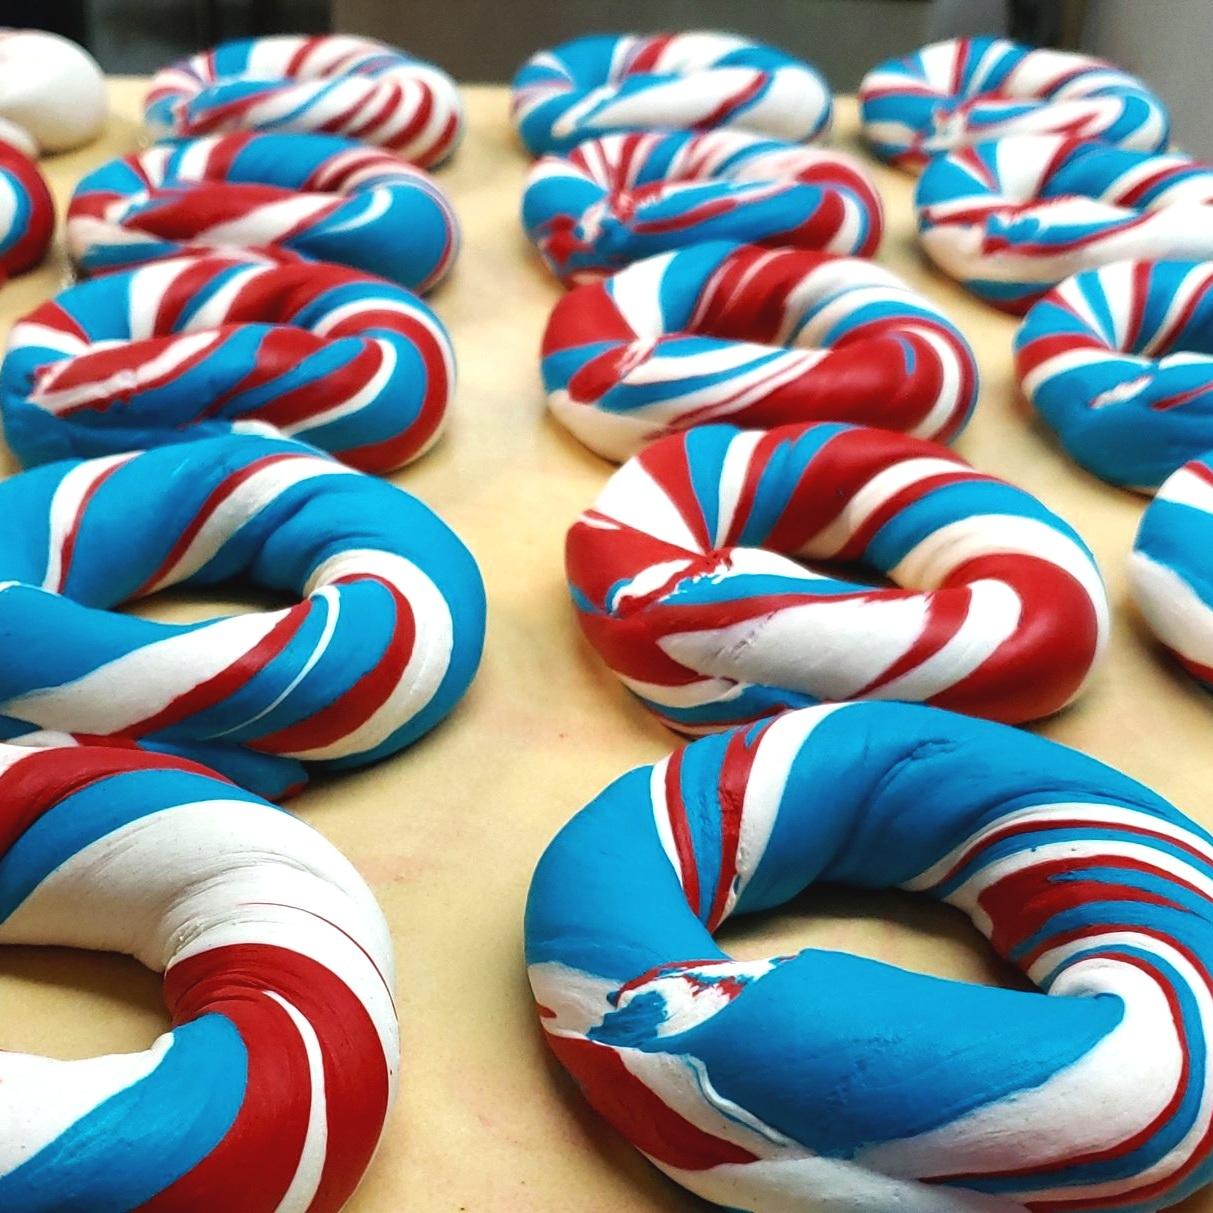 Captain America Bagel Art $4.15